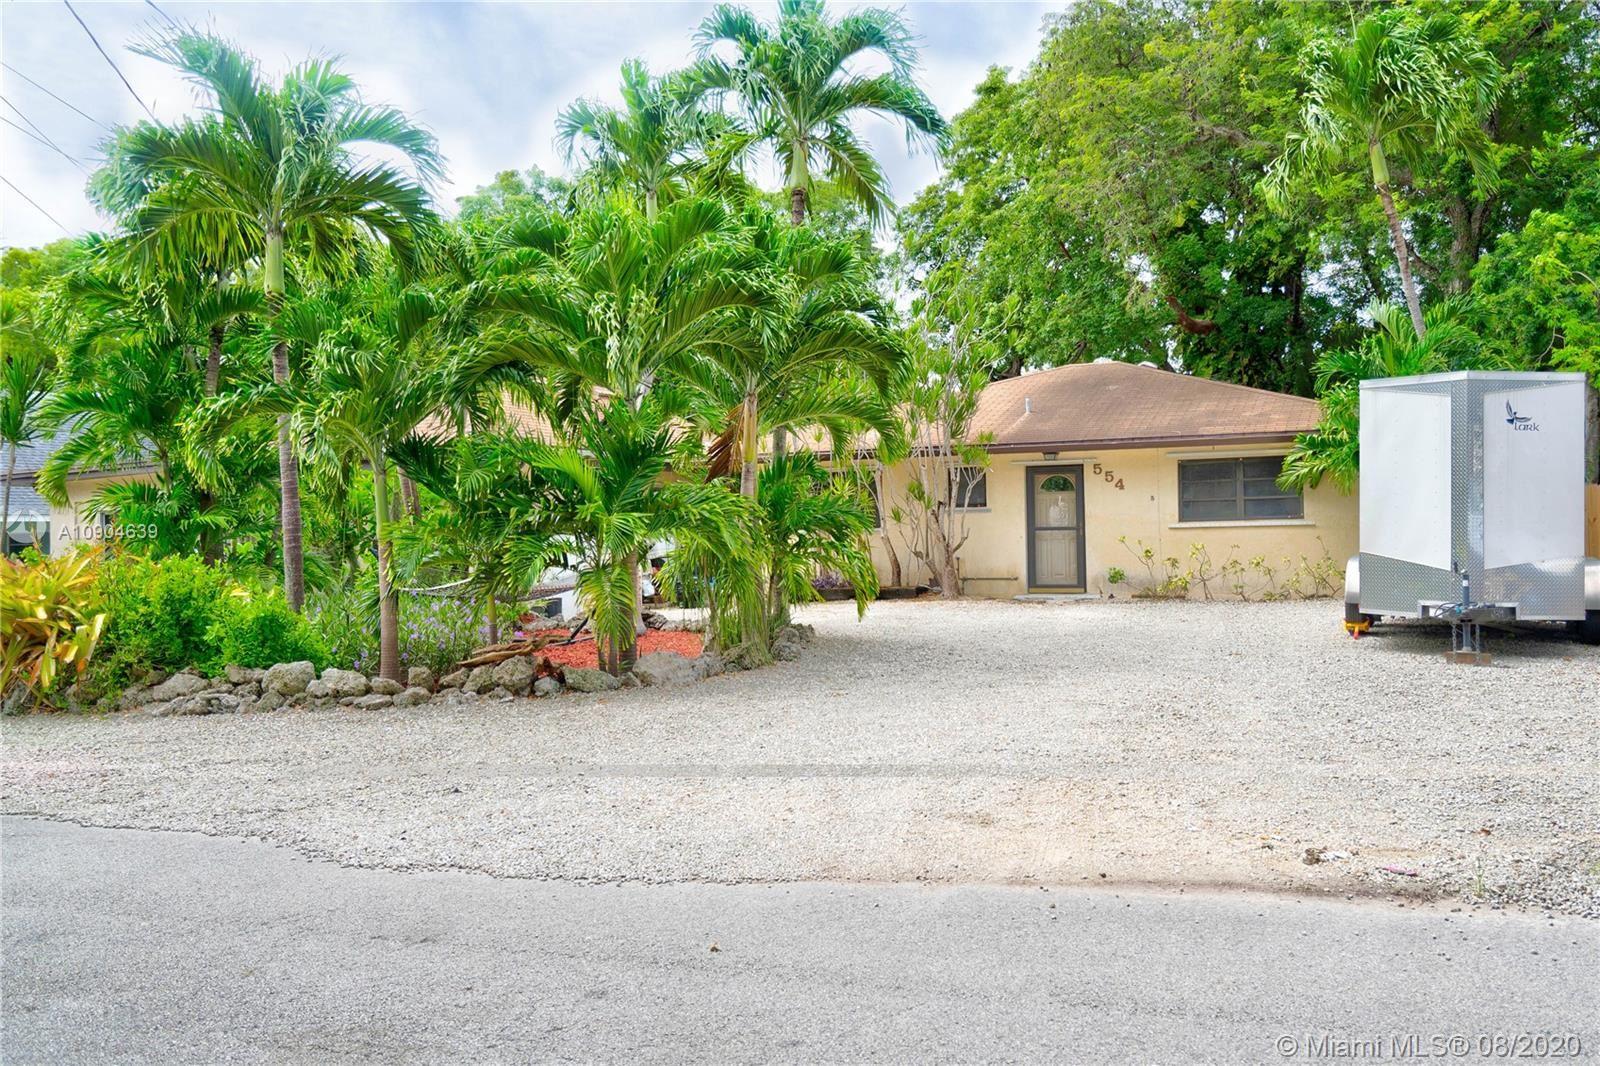 554 Palm Dr, Key Largo, FL 33037 - #: A10904639